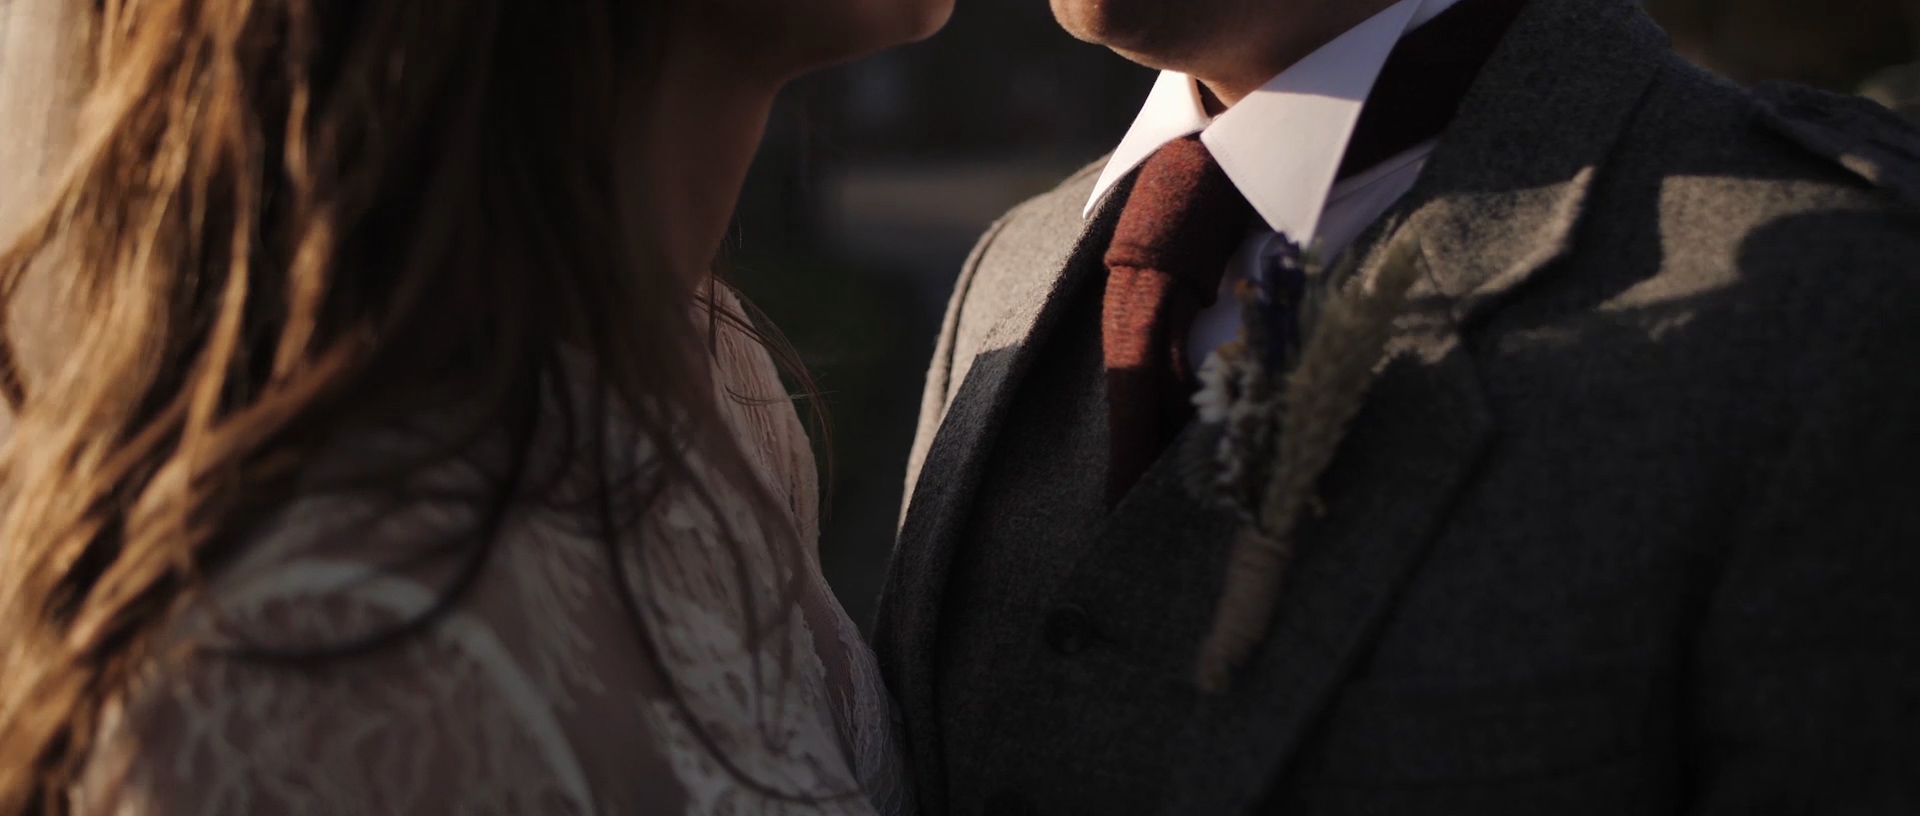 sloans-wedding-videographer_LL_04.jpg